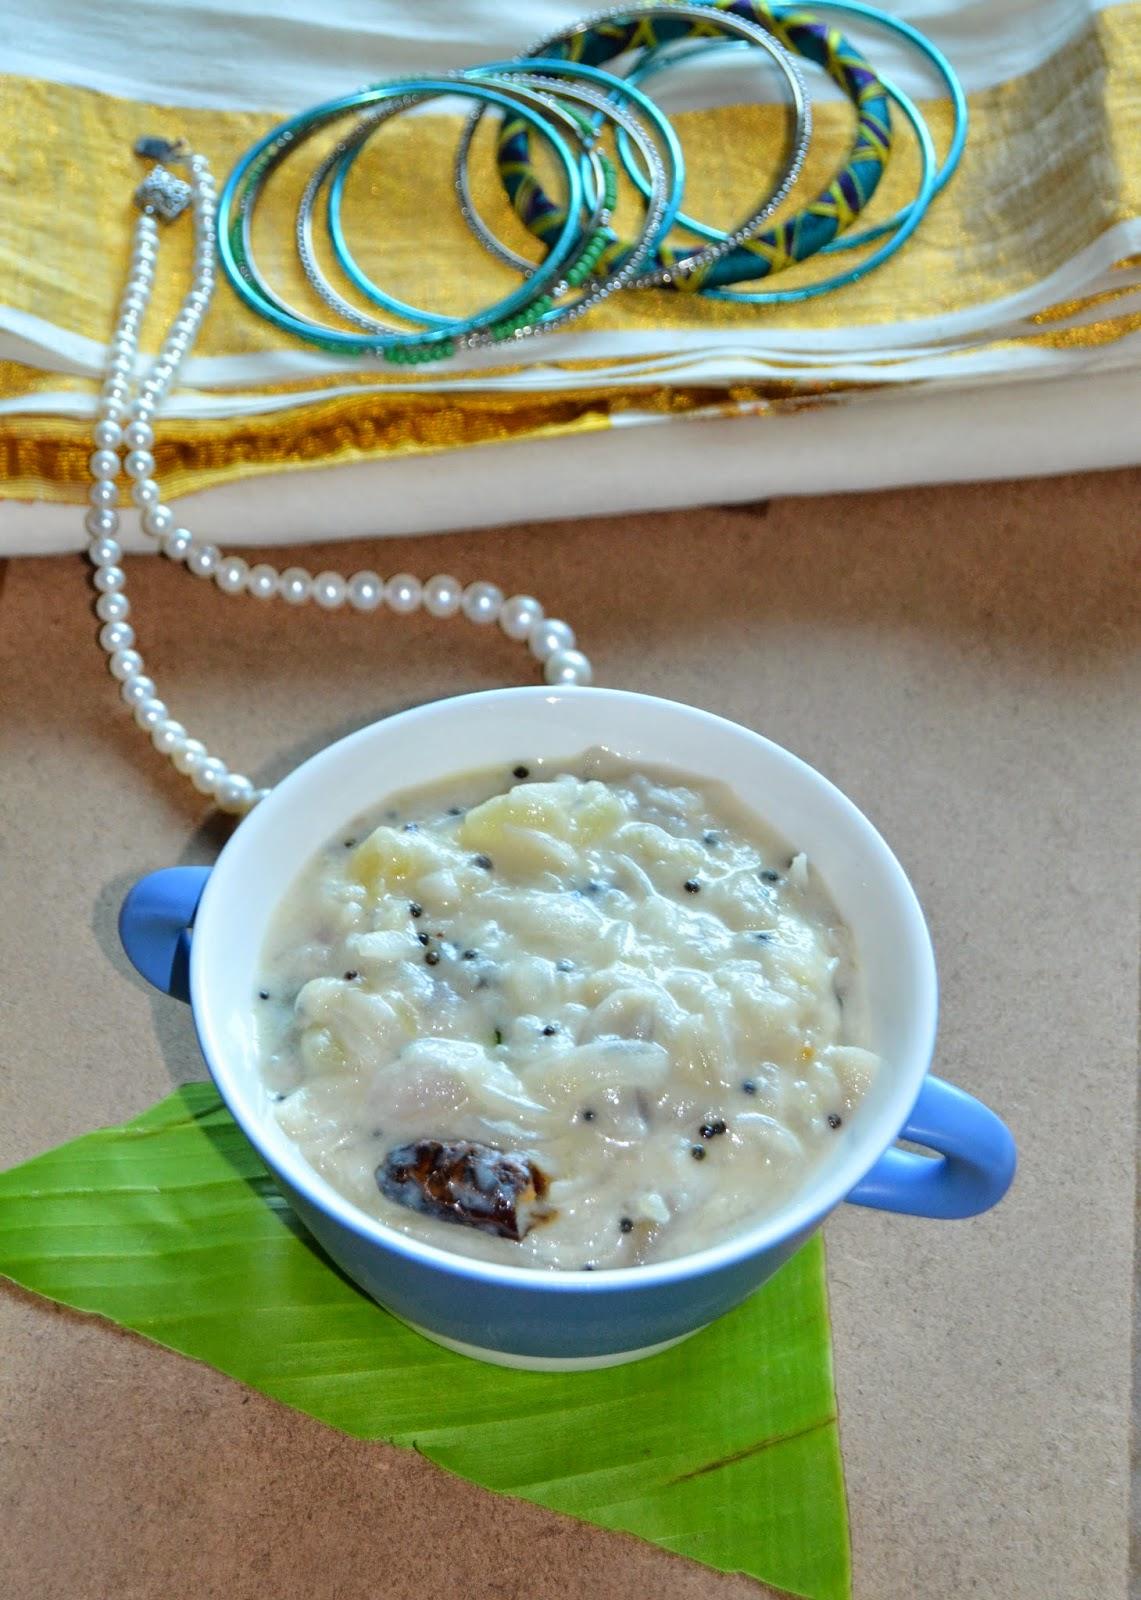 Anu\'s Kitchendelights: OIan Recipe - Easy and Quick Potato Oalan Recipe